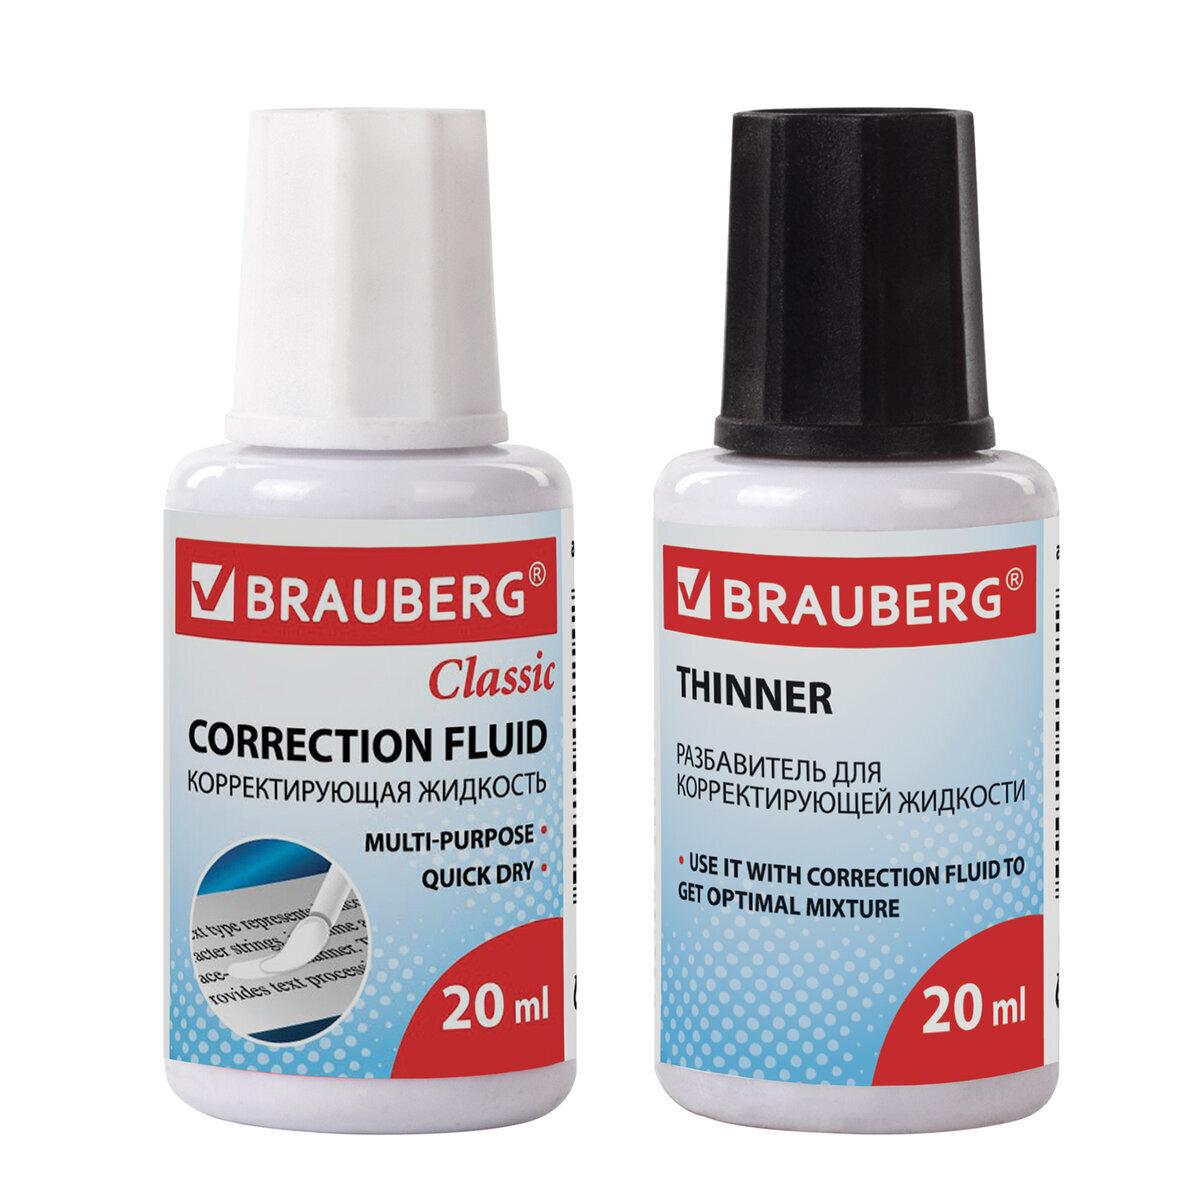 Корректор / штрих / замазка / жидкость канцелярская + разбавитель, 20+20 мл, Brauberg  #1